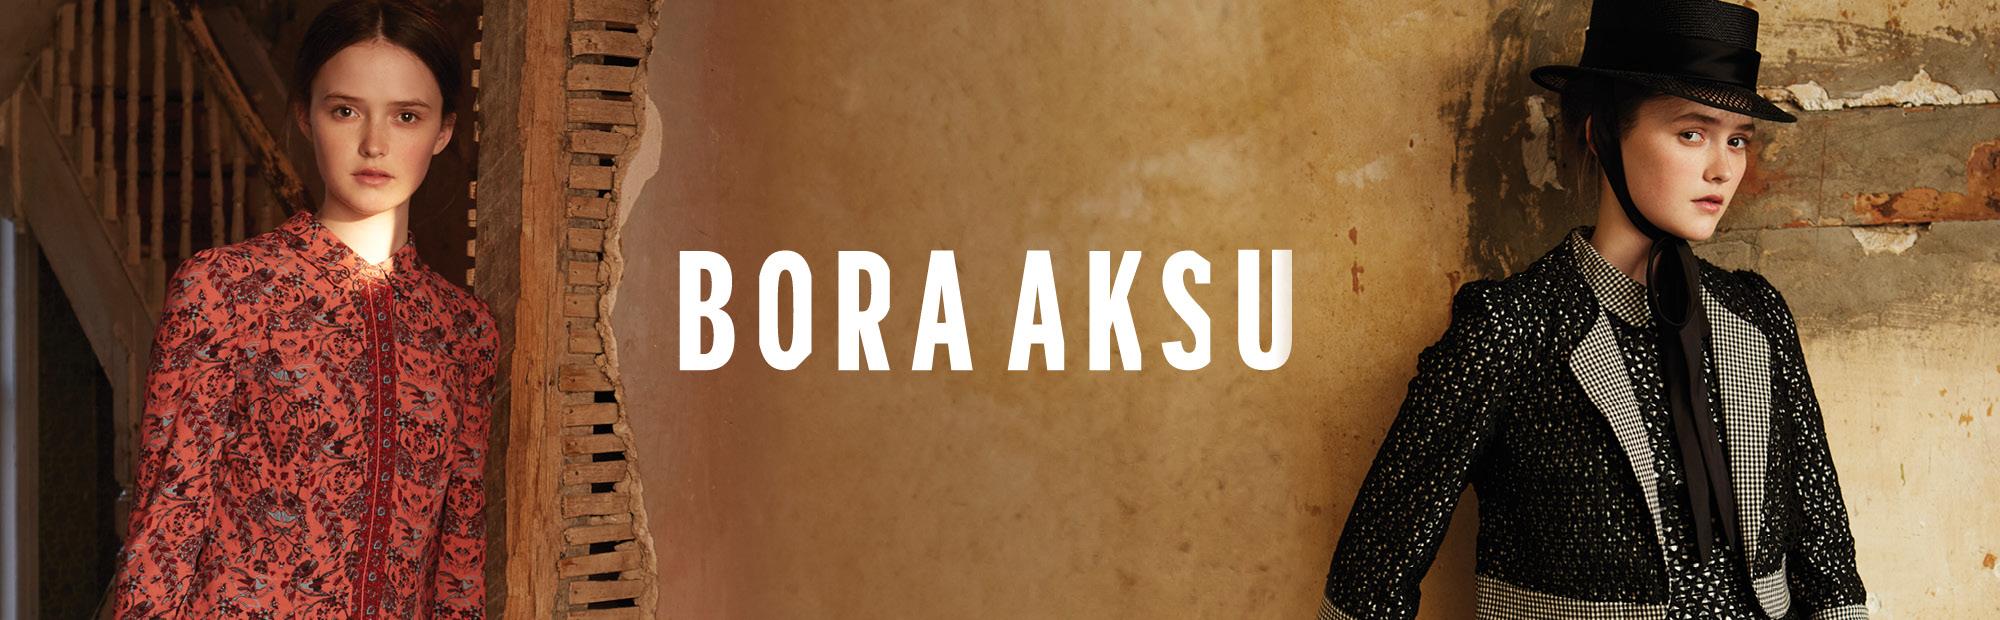 Bora Aksu Macao